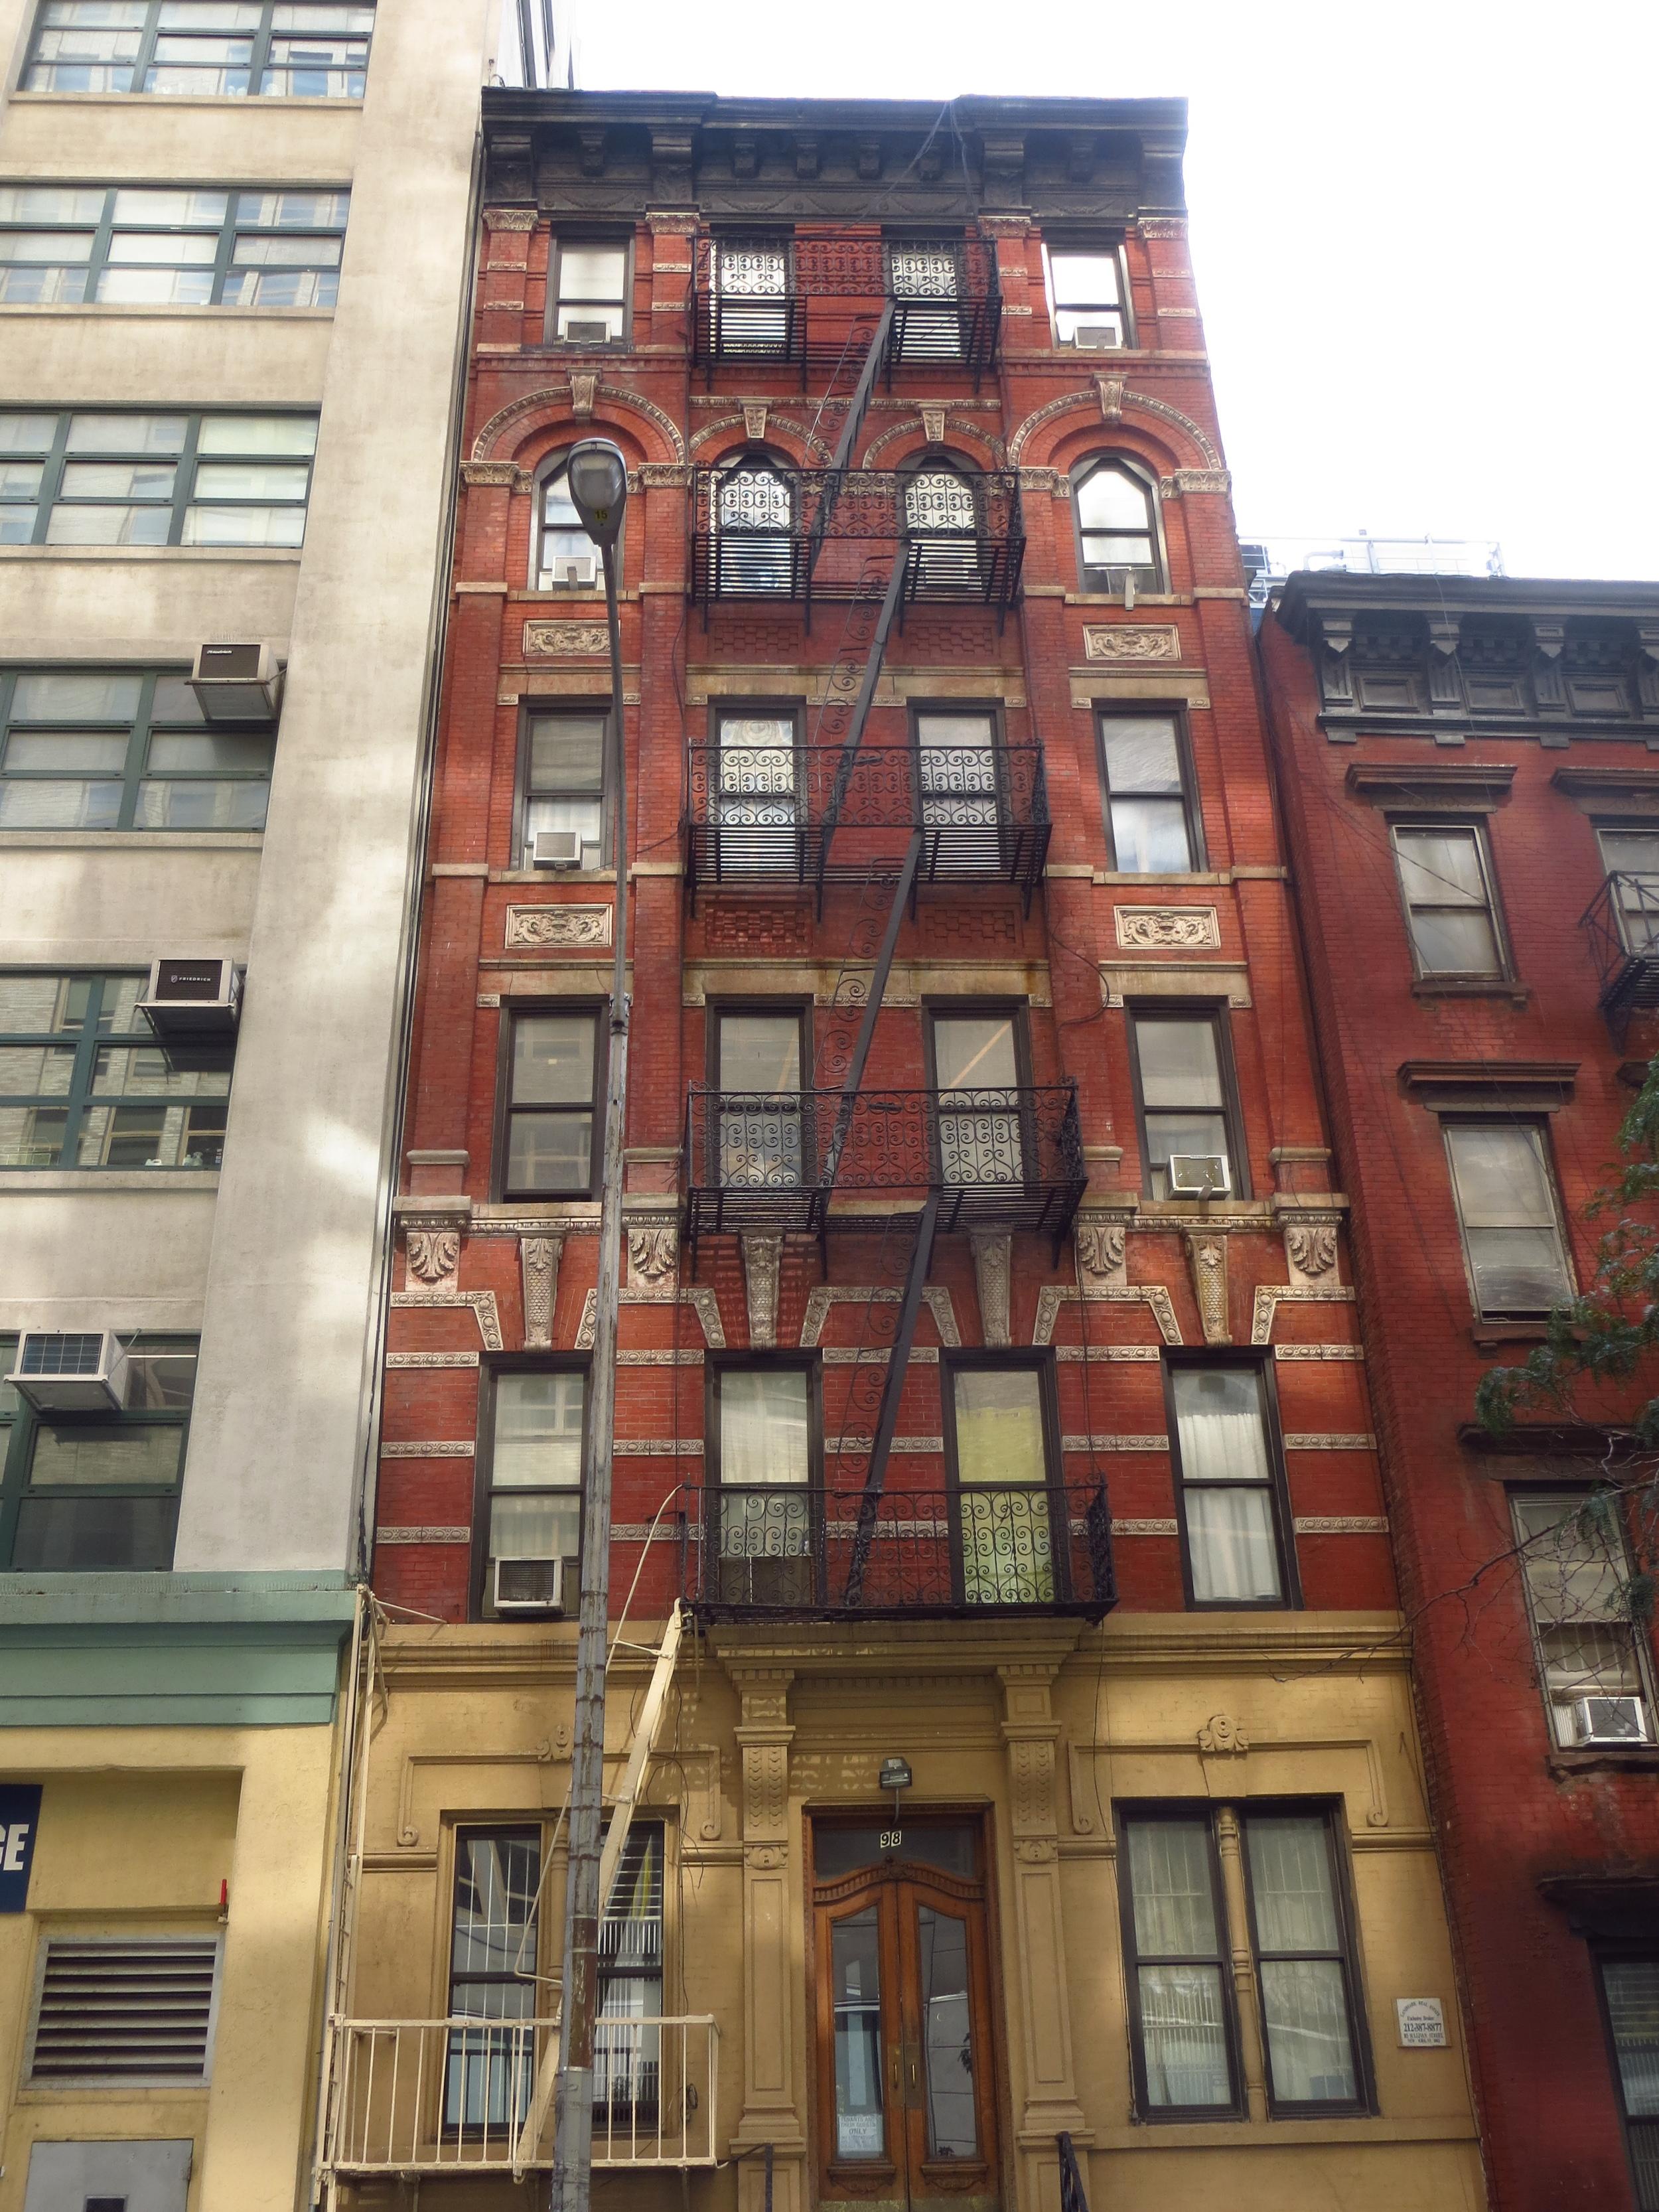 Old tenement building